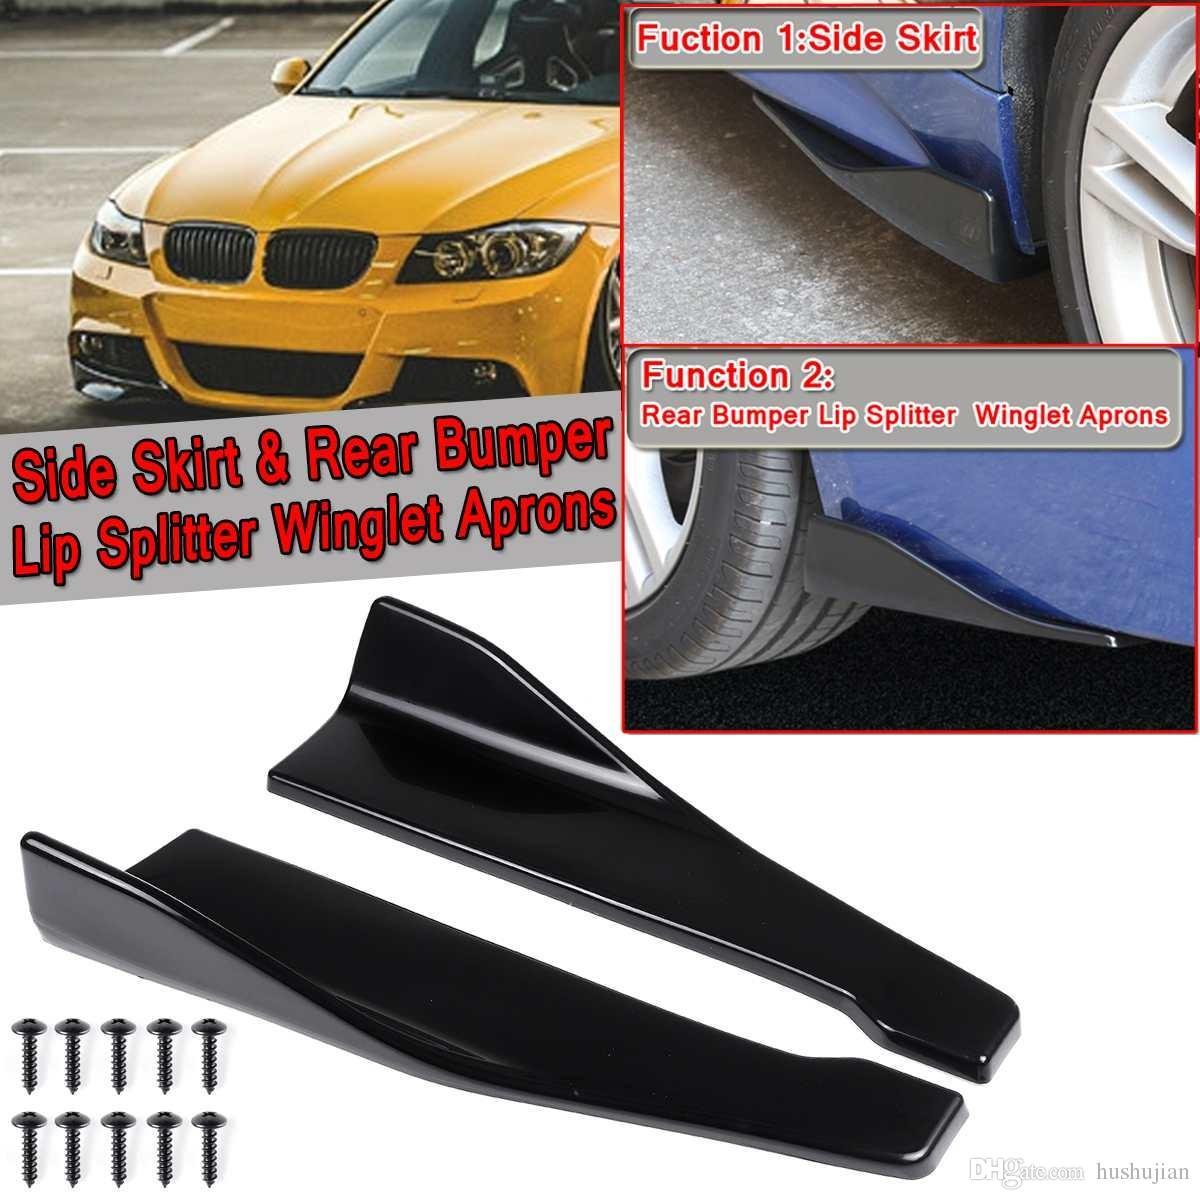 1 Set Universal Side Skirt /& Rear Bumper Lip 35cm Strip Splitter Winglet Aprons